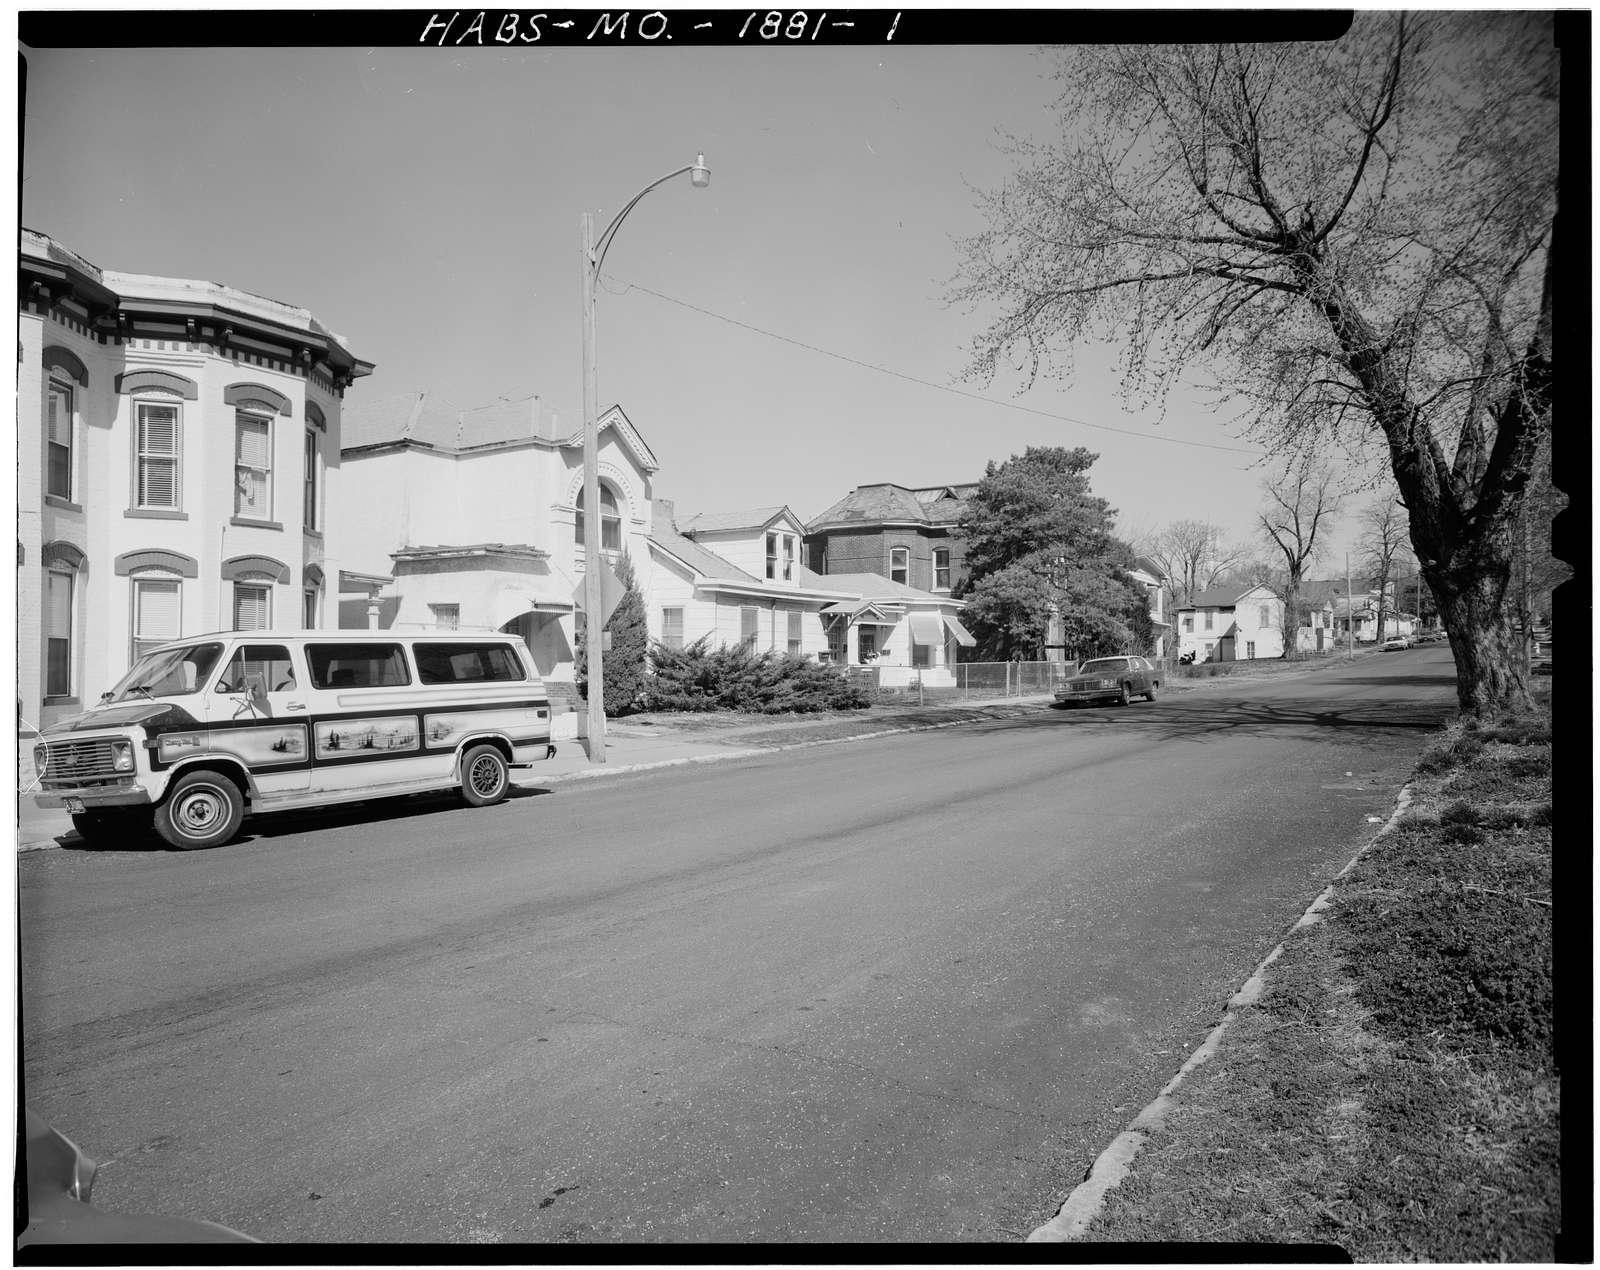 806-808 South Eleventh Street (House), 806-808 South Eleventh Street, Saint Joseph, Buchanan County, MO